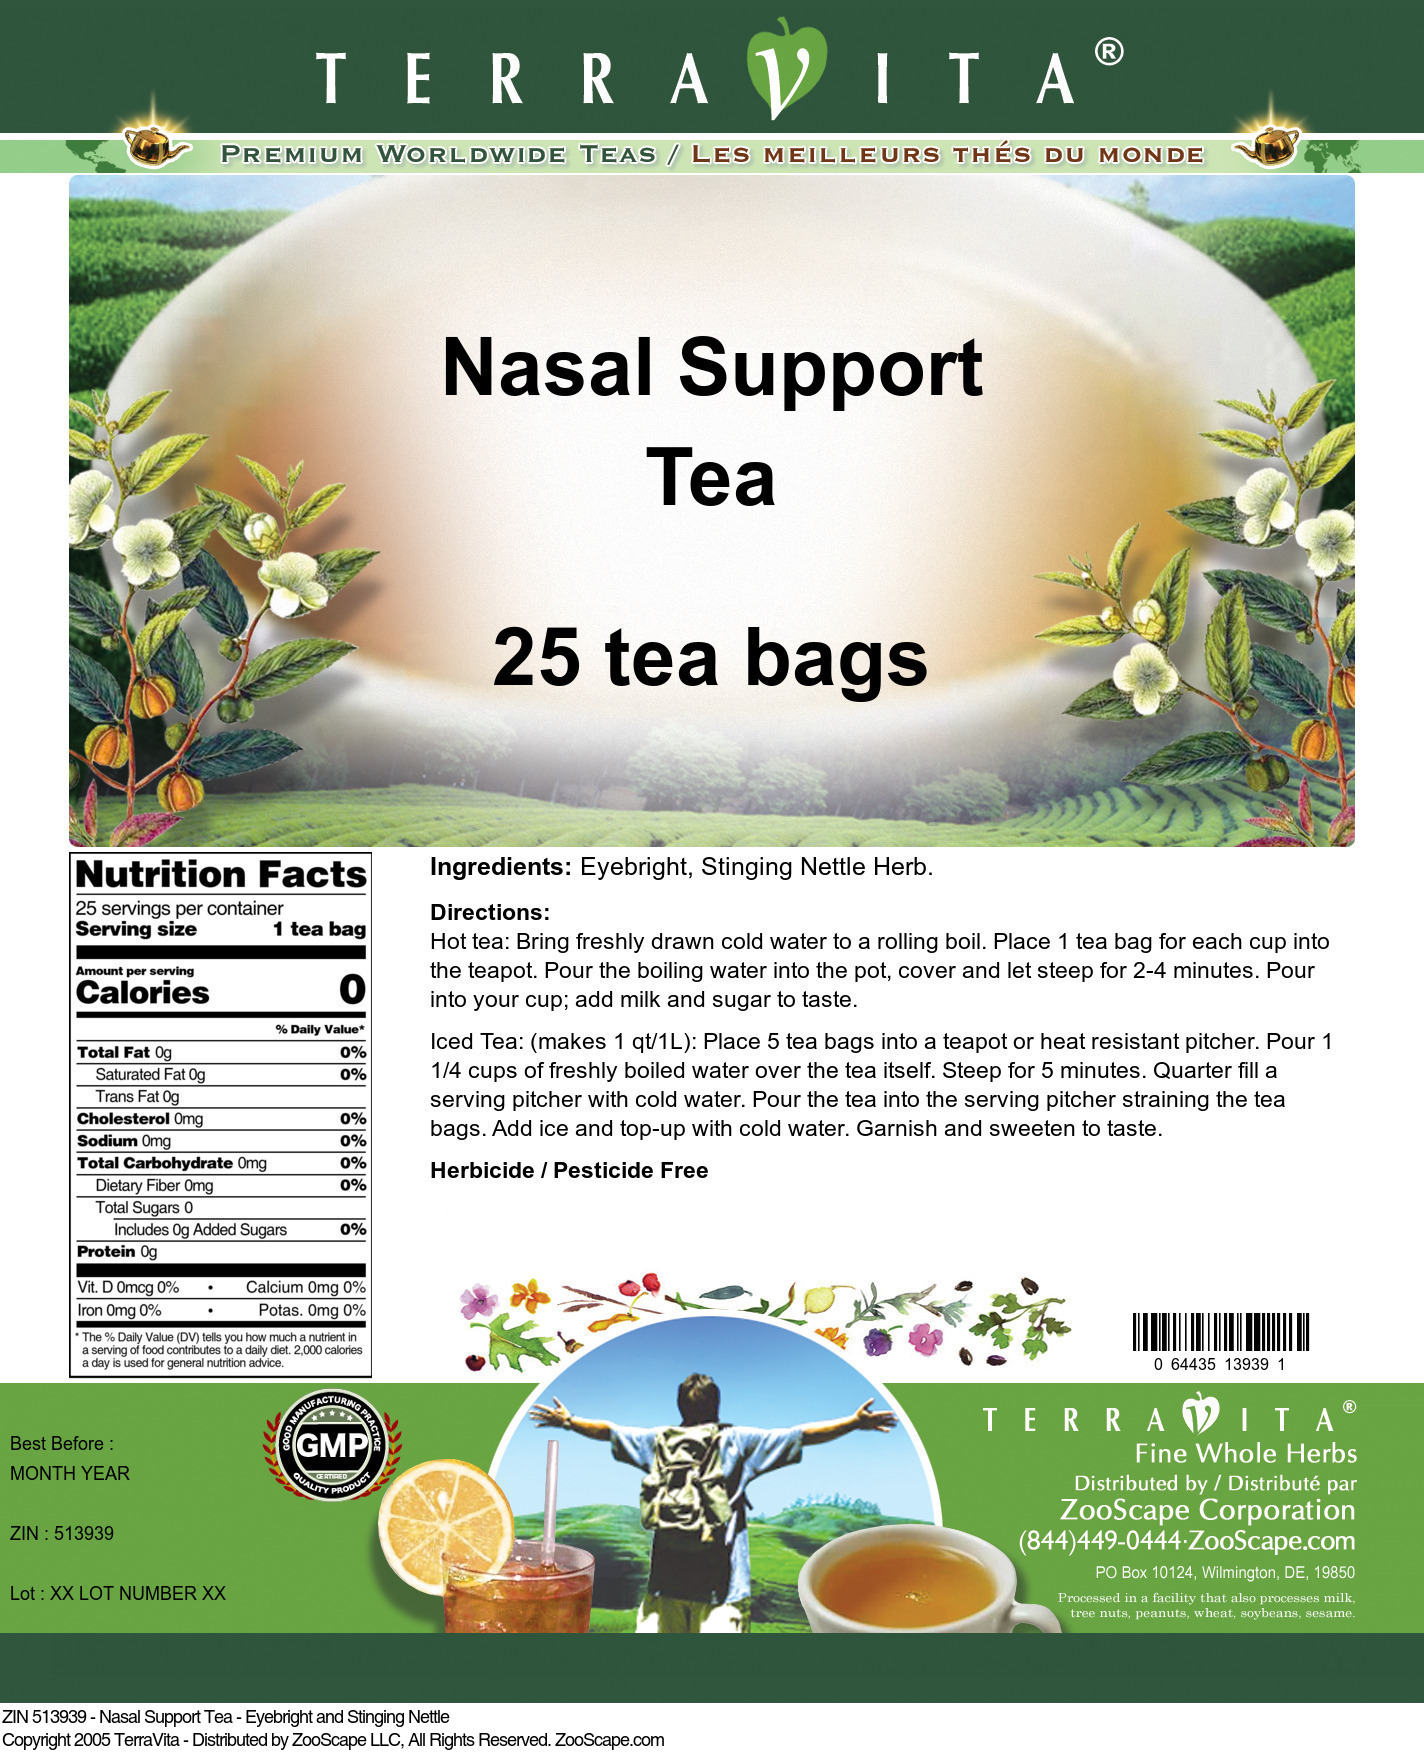 Nasal Support Tea - Eyebright and Stinging Nettle